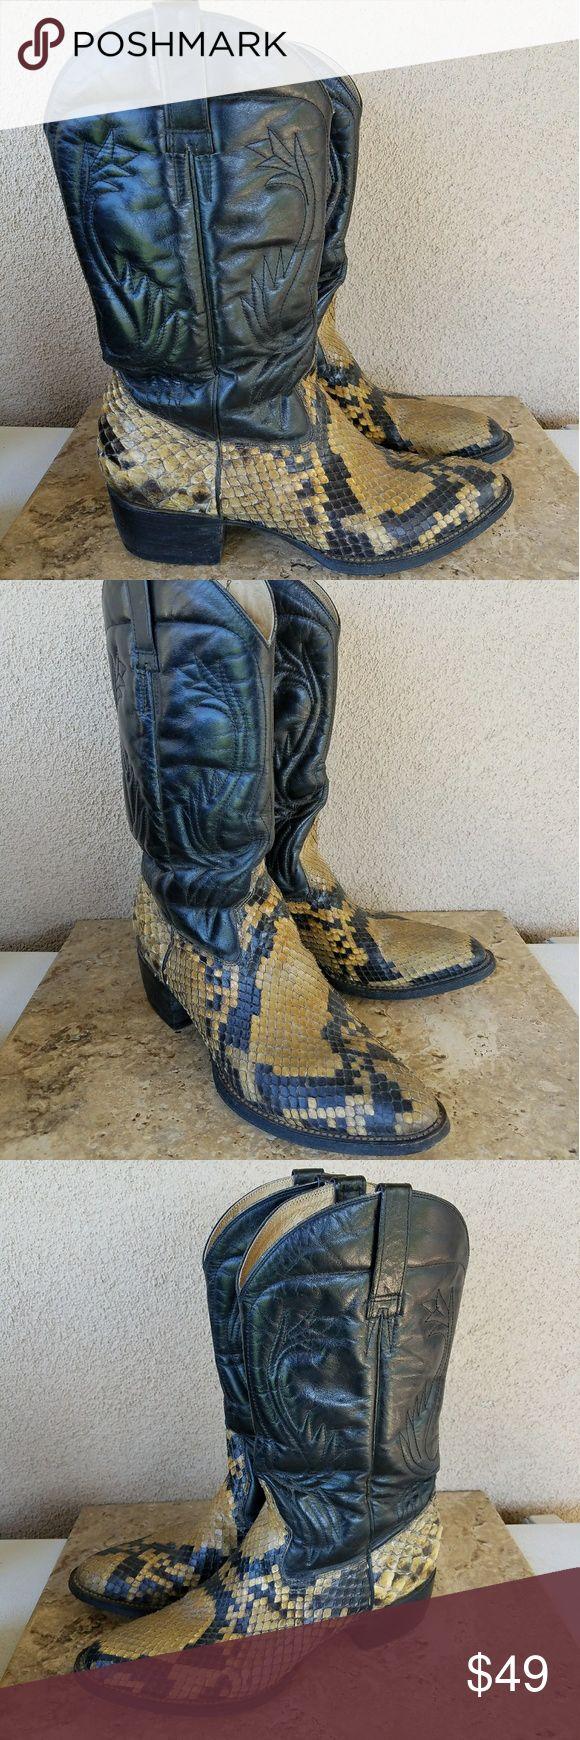 Snakeskin Cowboy Boots Size 9.5 Snakeskin cowboy boots size 9.5 Shoes